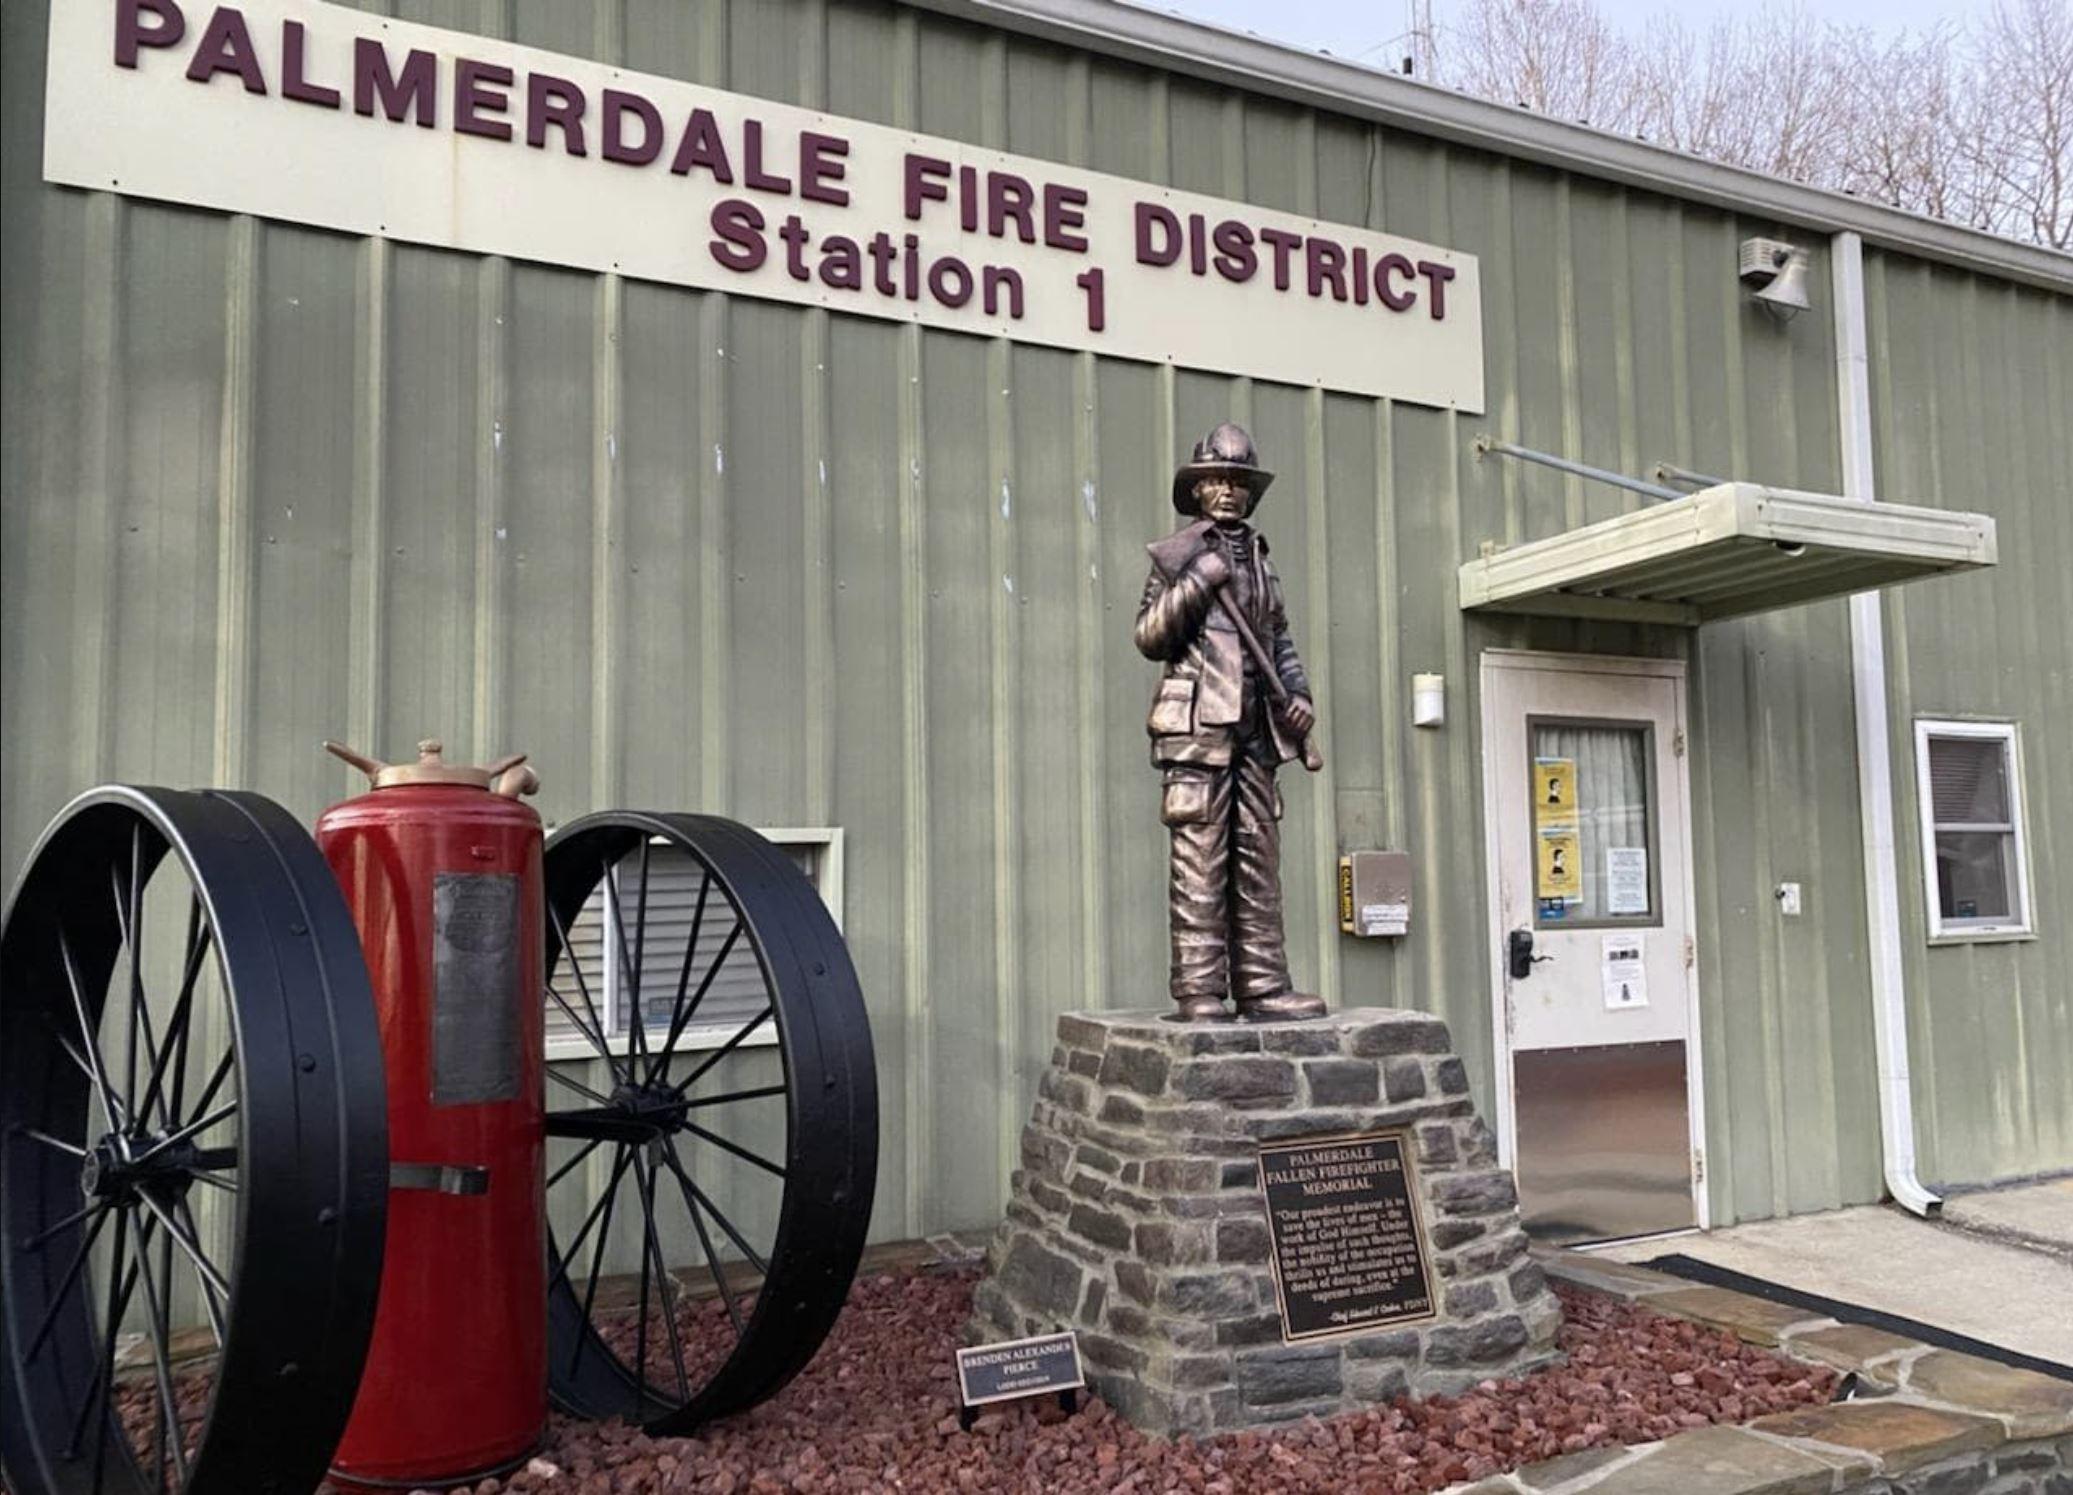 VIDEO: Fallen Firefighter Memorial dedicated in Palmerdale